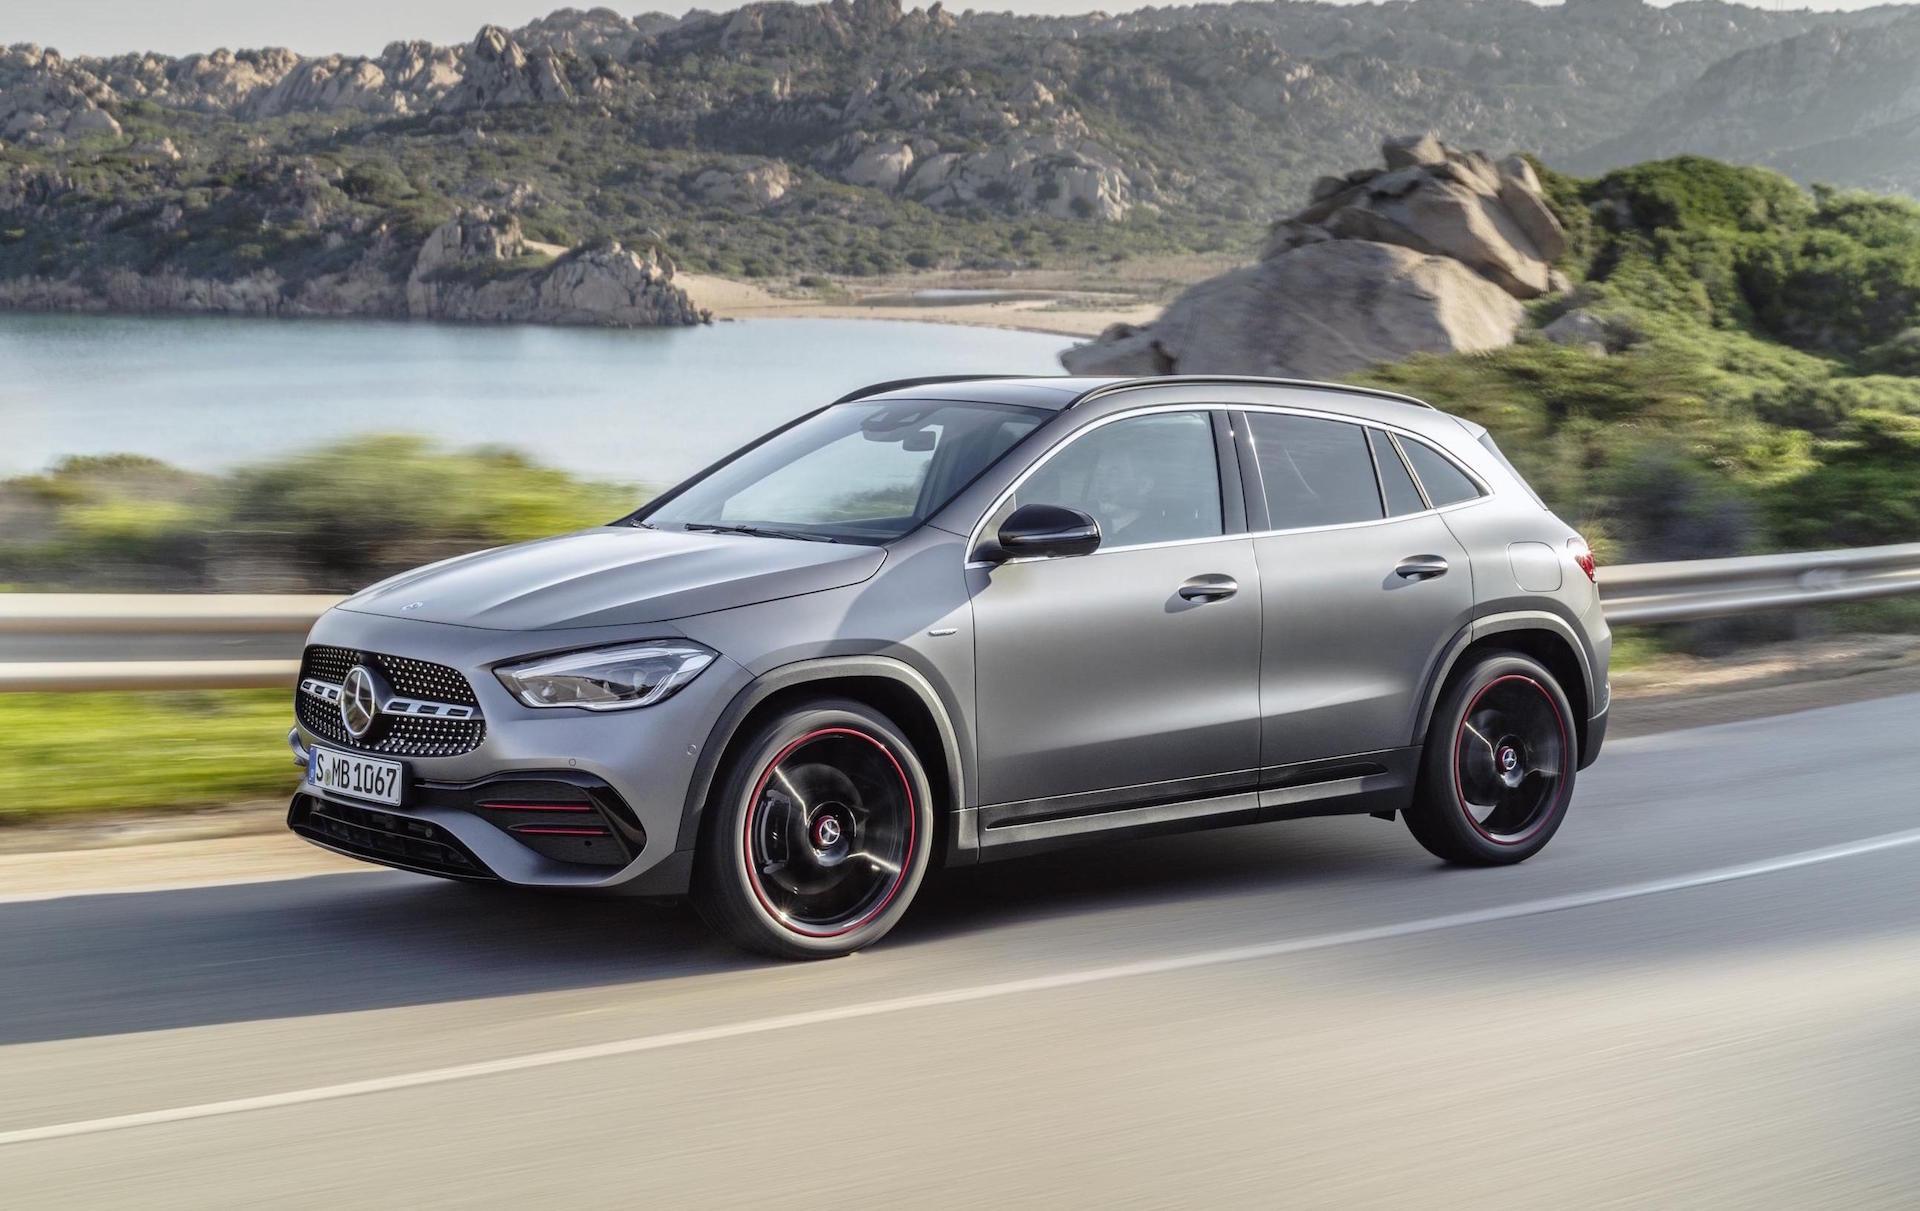 2020 Mercedes-Benz GLA unveiled, adds GLA 35 AMG variant